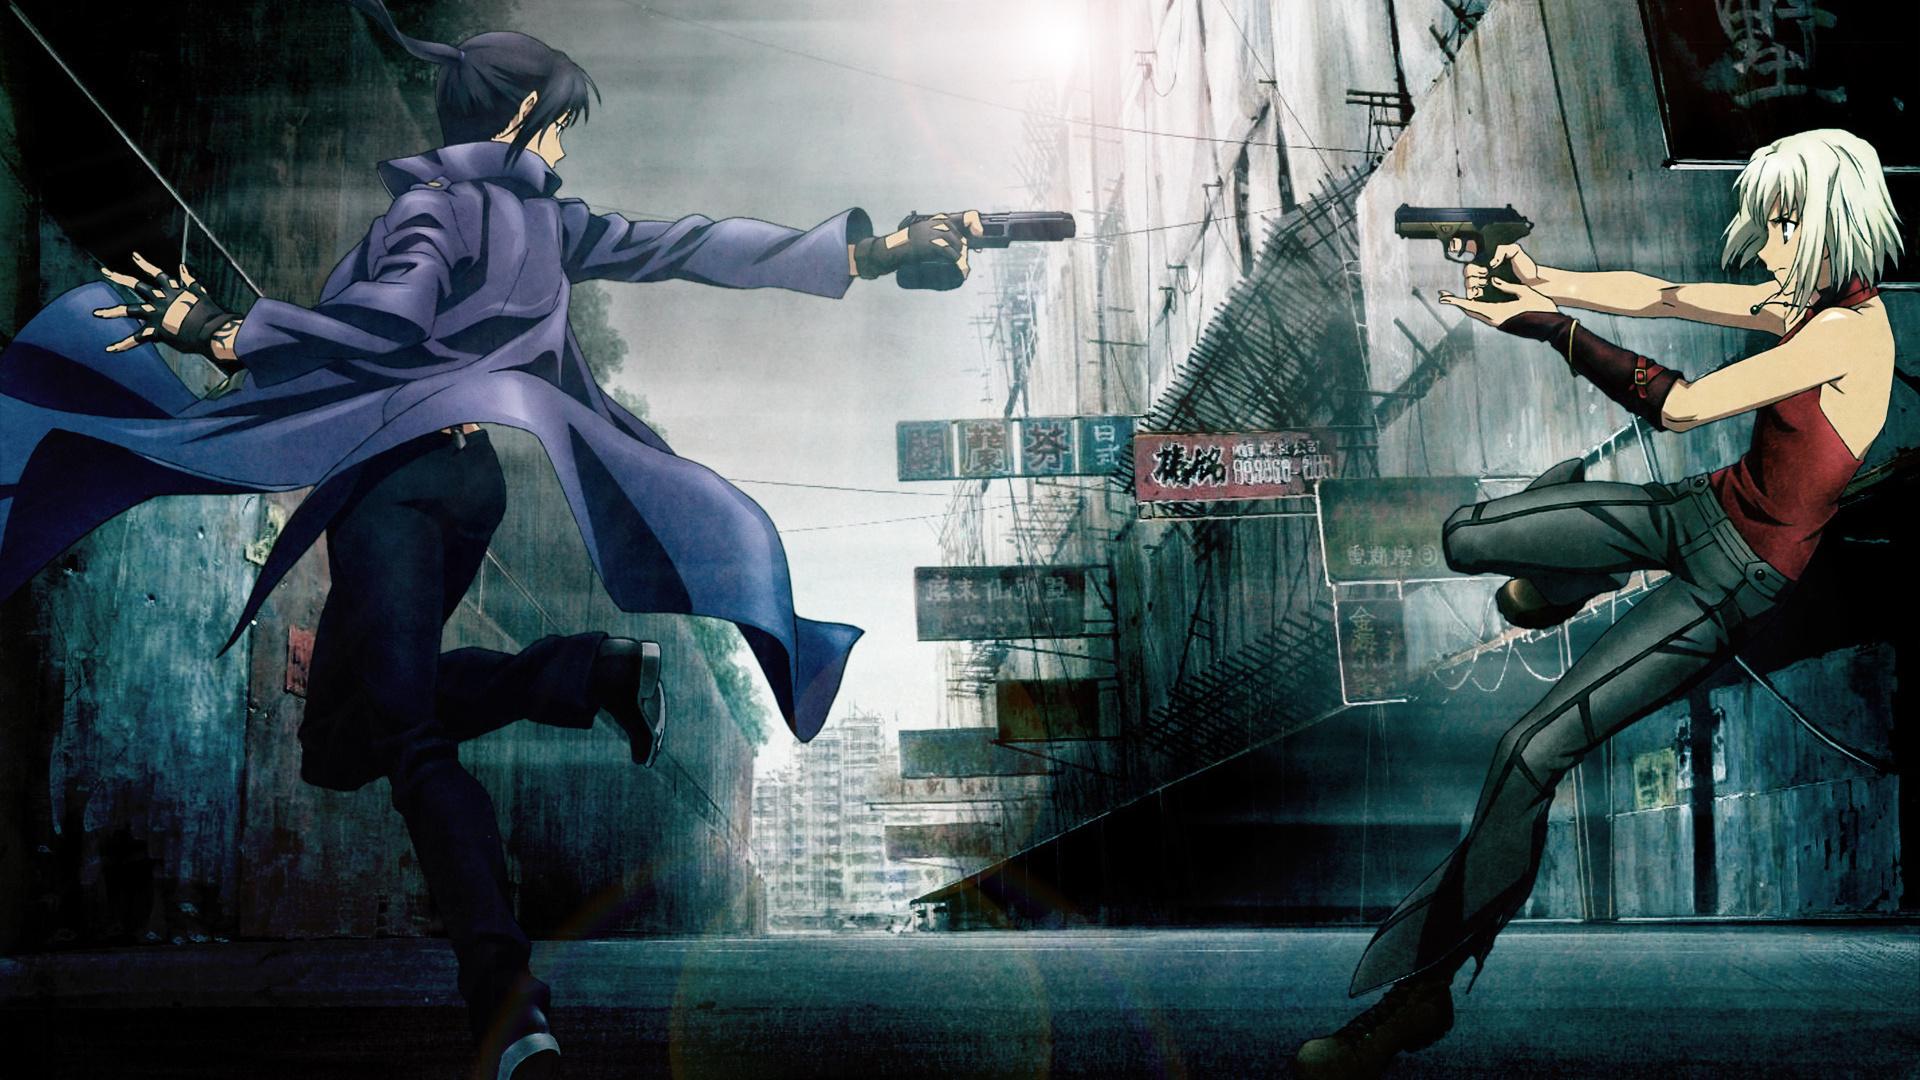 67 anime gun wallpaper Pictures